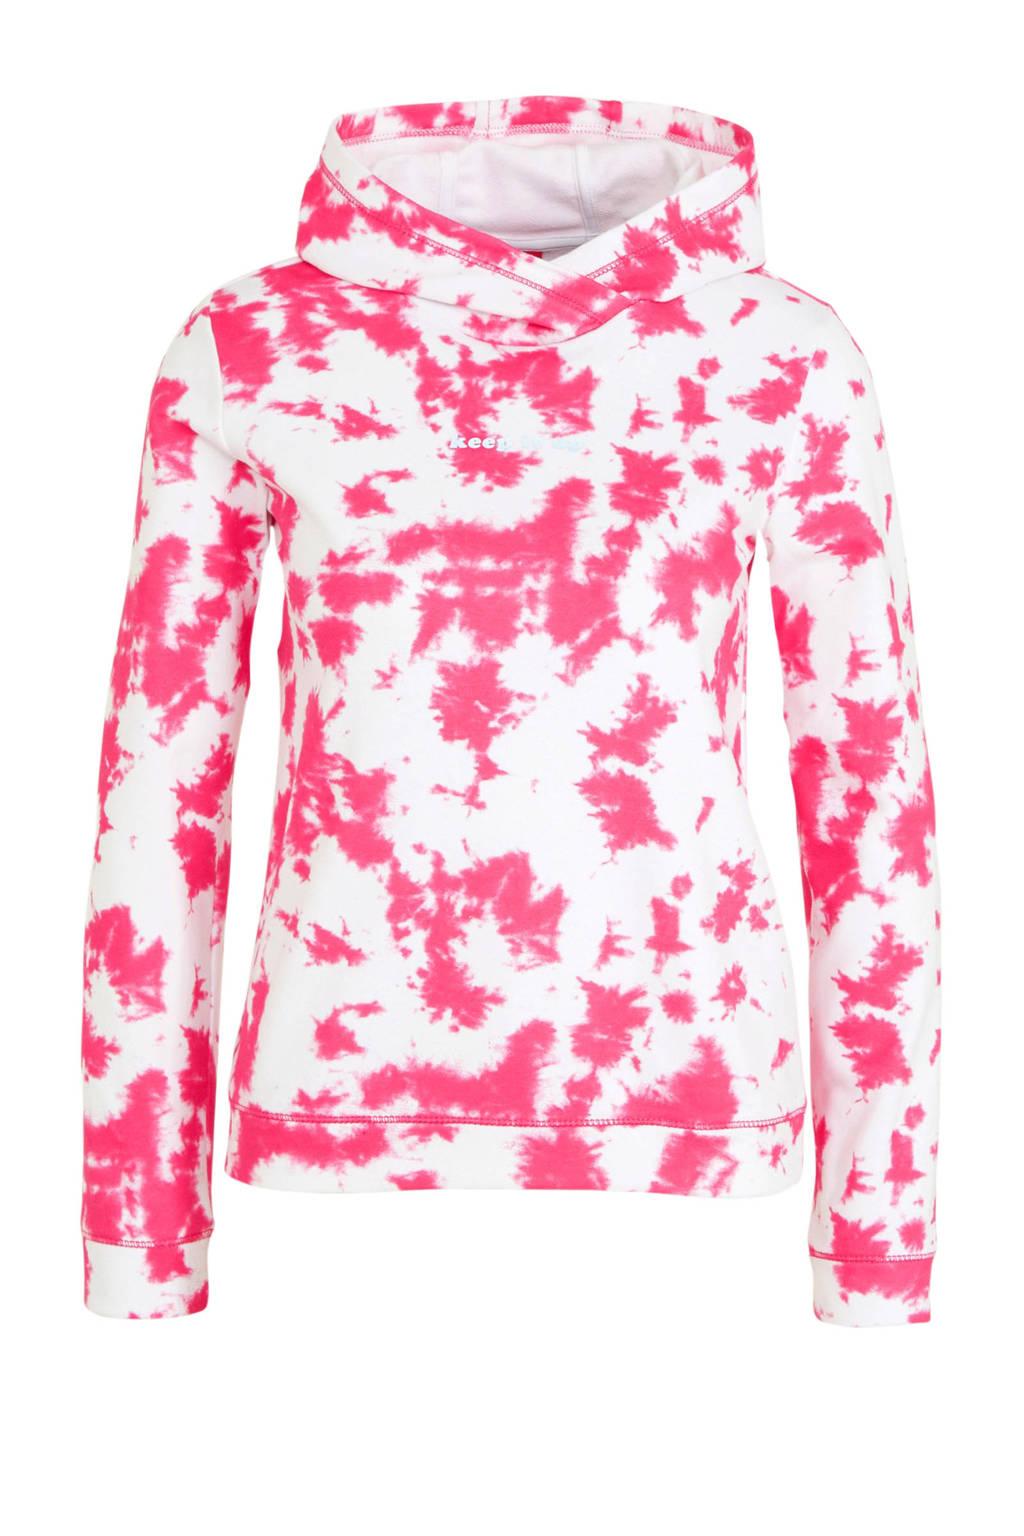 s.Oliver hoodie met all over print en overslag detail wit/roze, Wit/roze